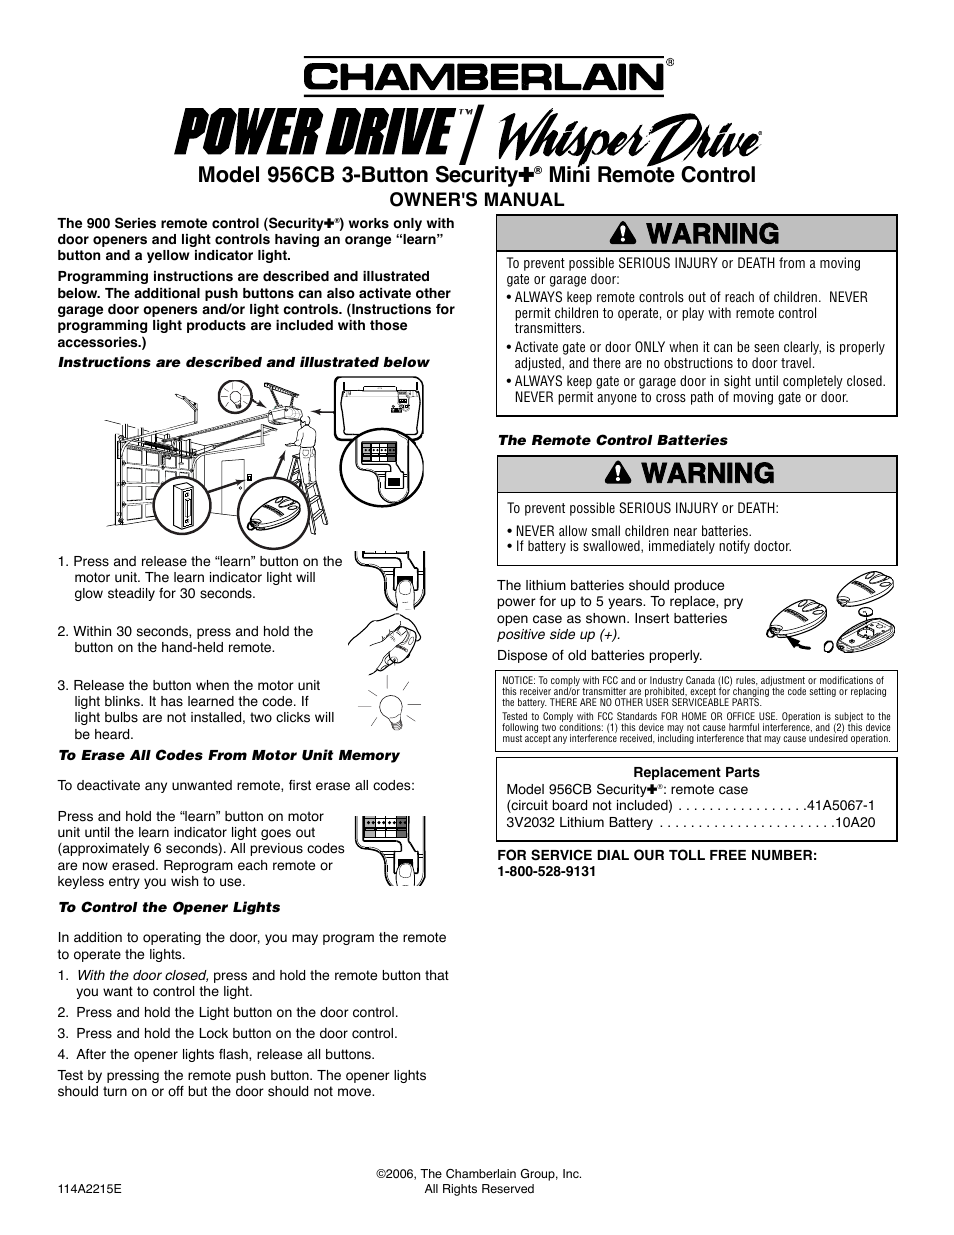 Chamberlain 956cb User Manual 1 Page Circuit Board